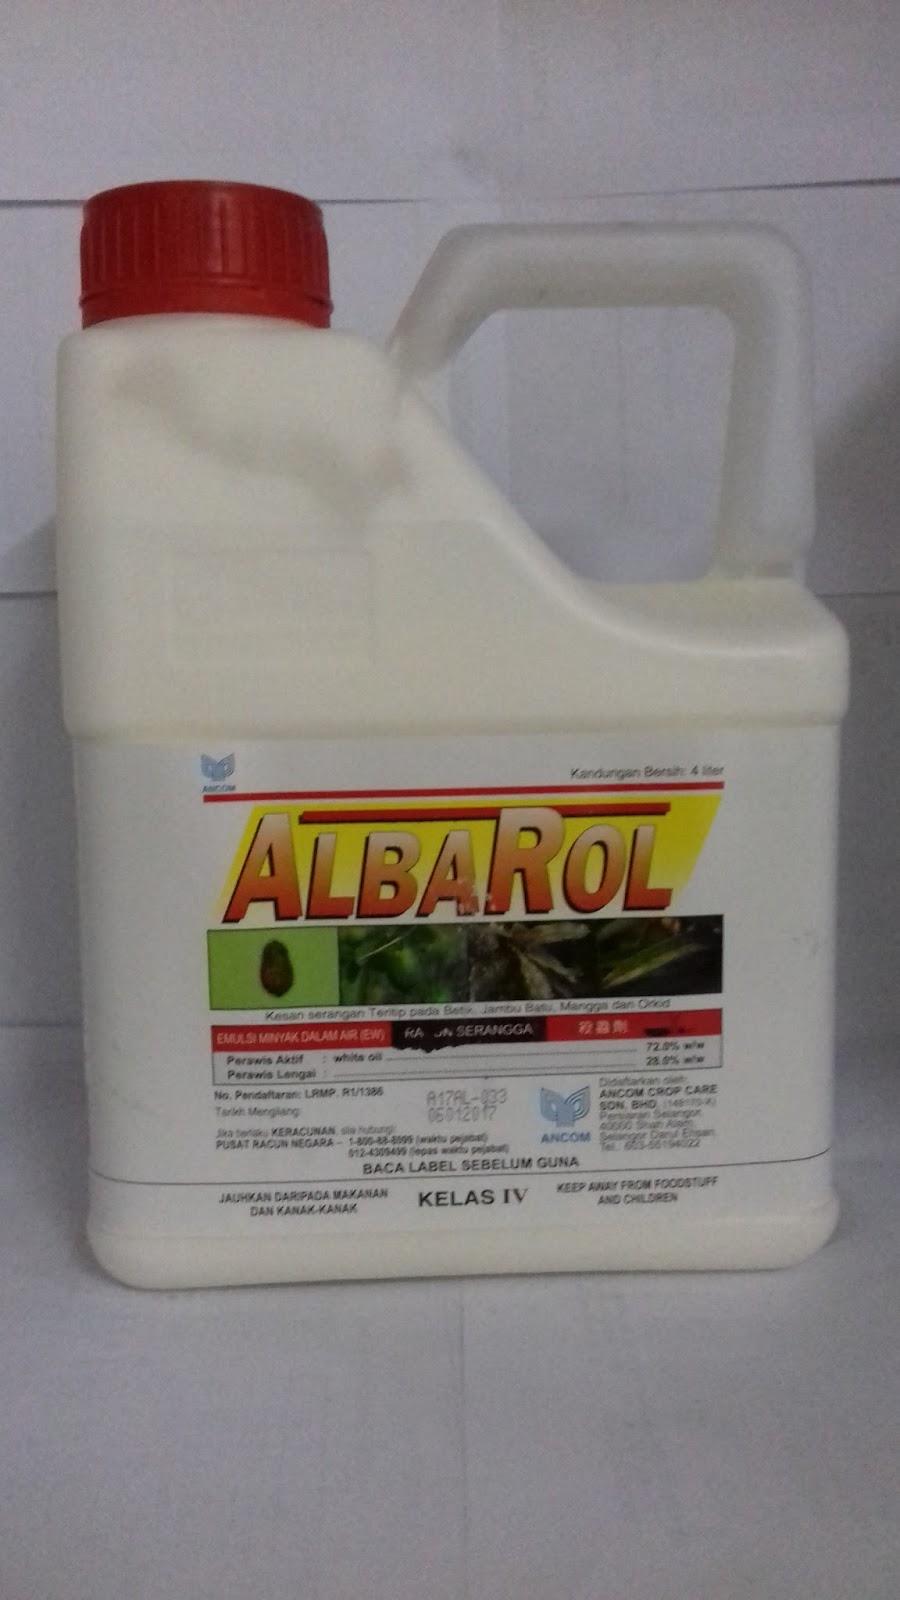 Albarol - RM25.00